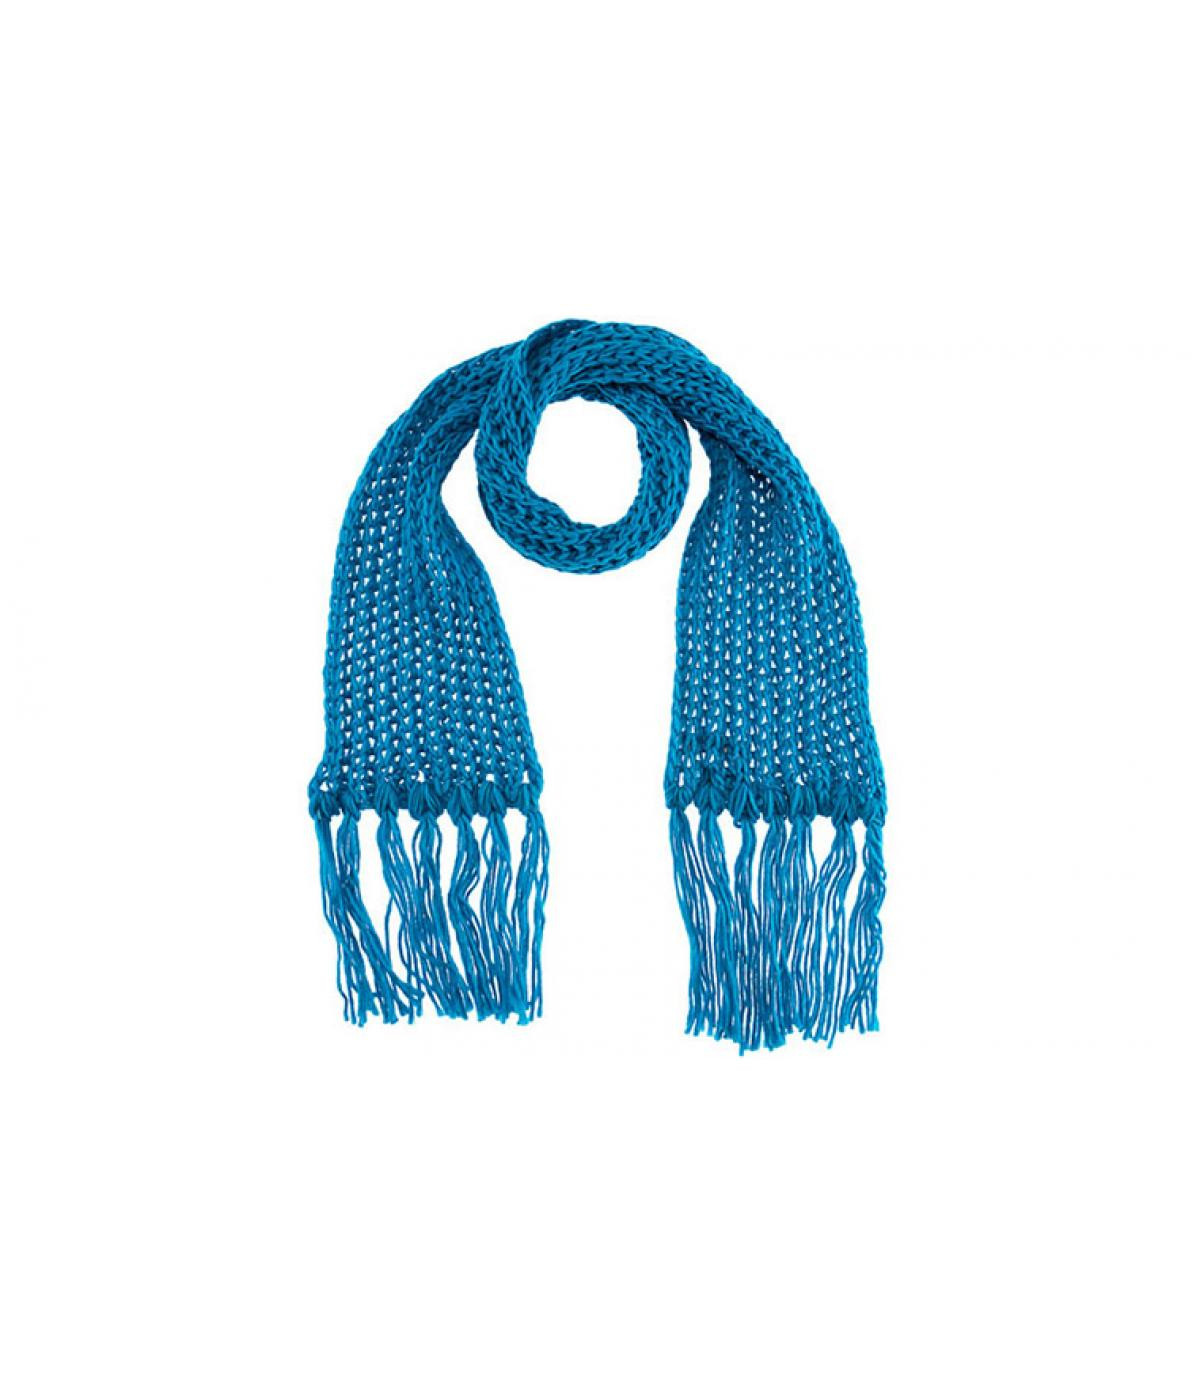 Turquoise scarf passigatti